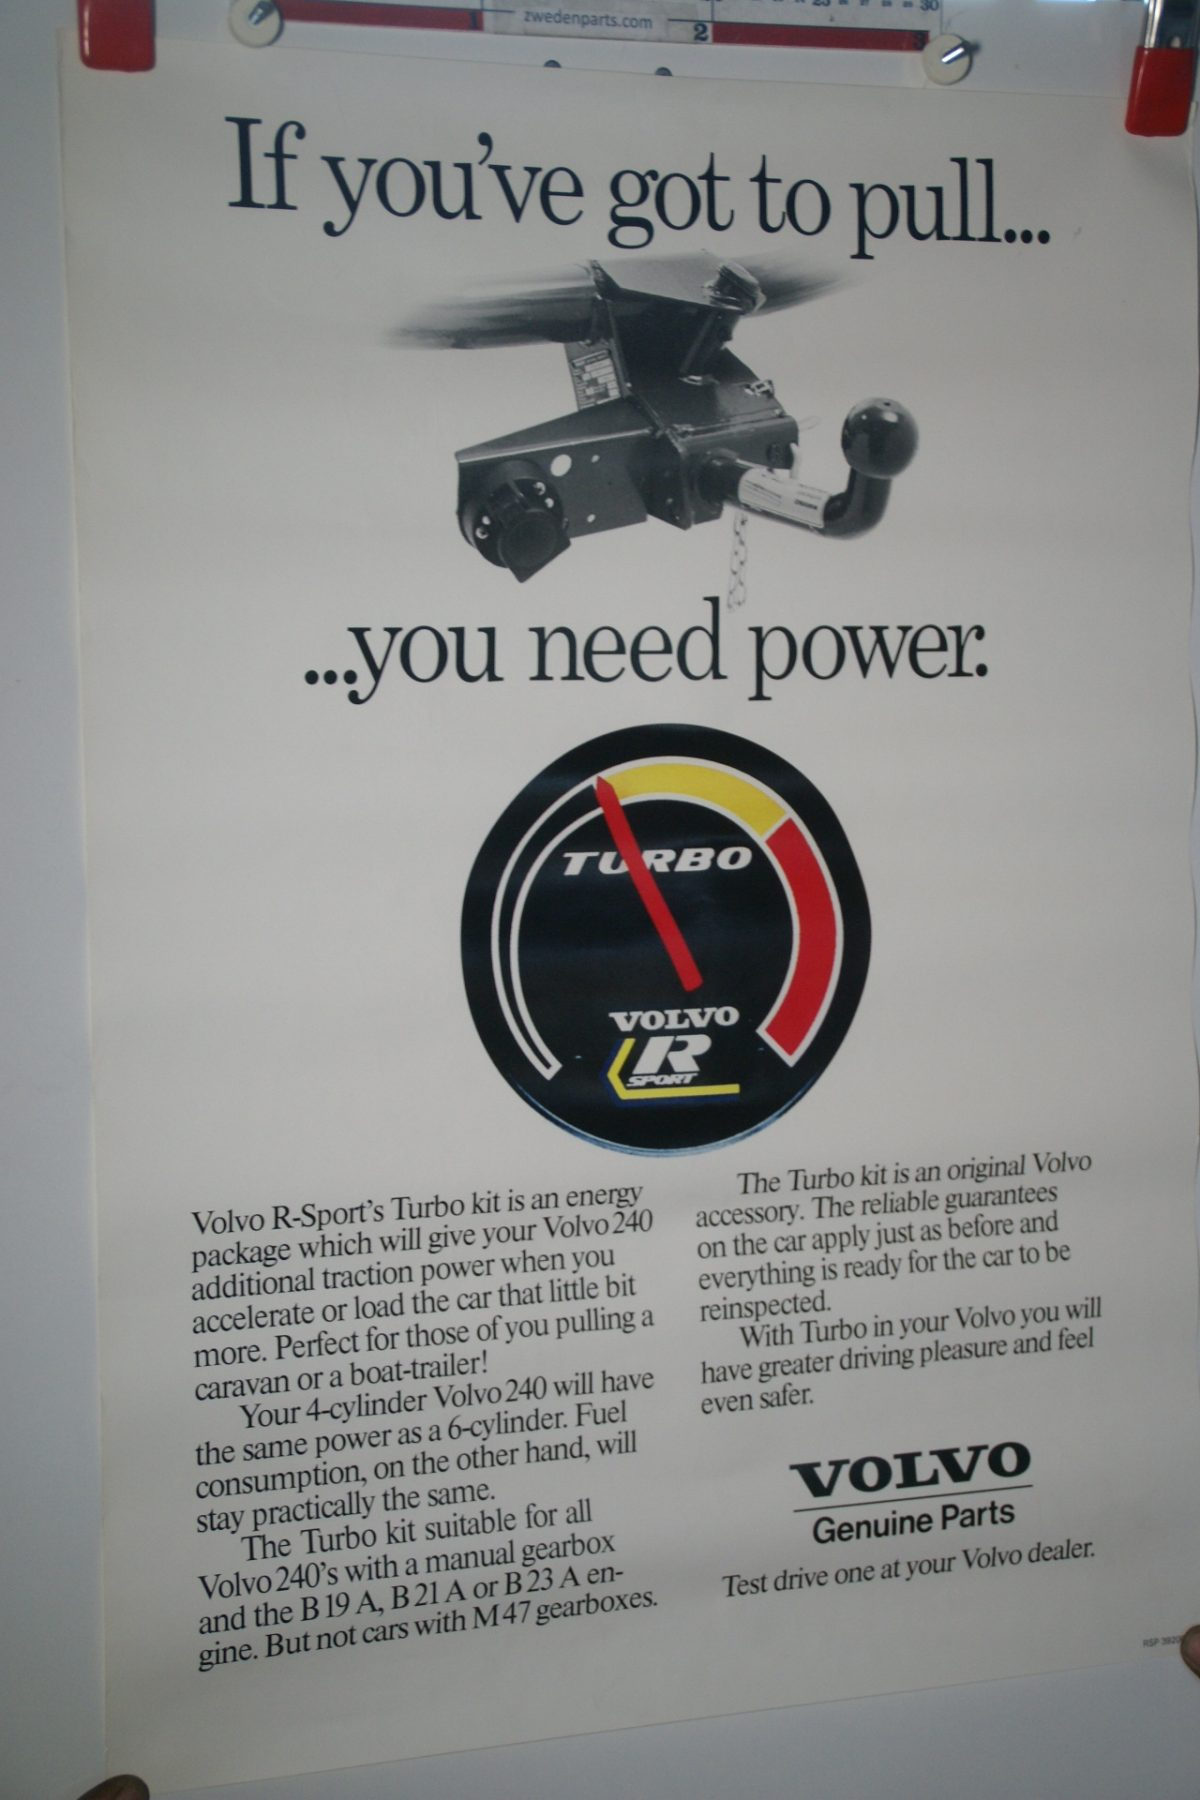 DSC02324 Volvo R sport turbo poster RSP 39200